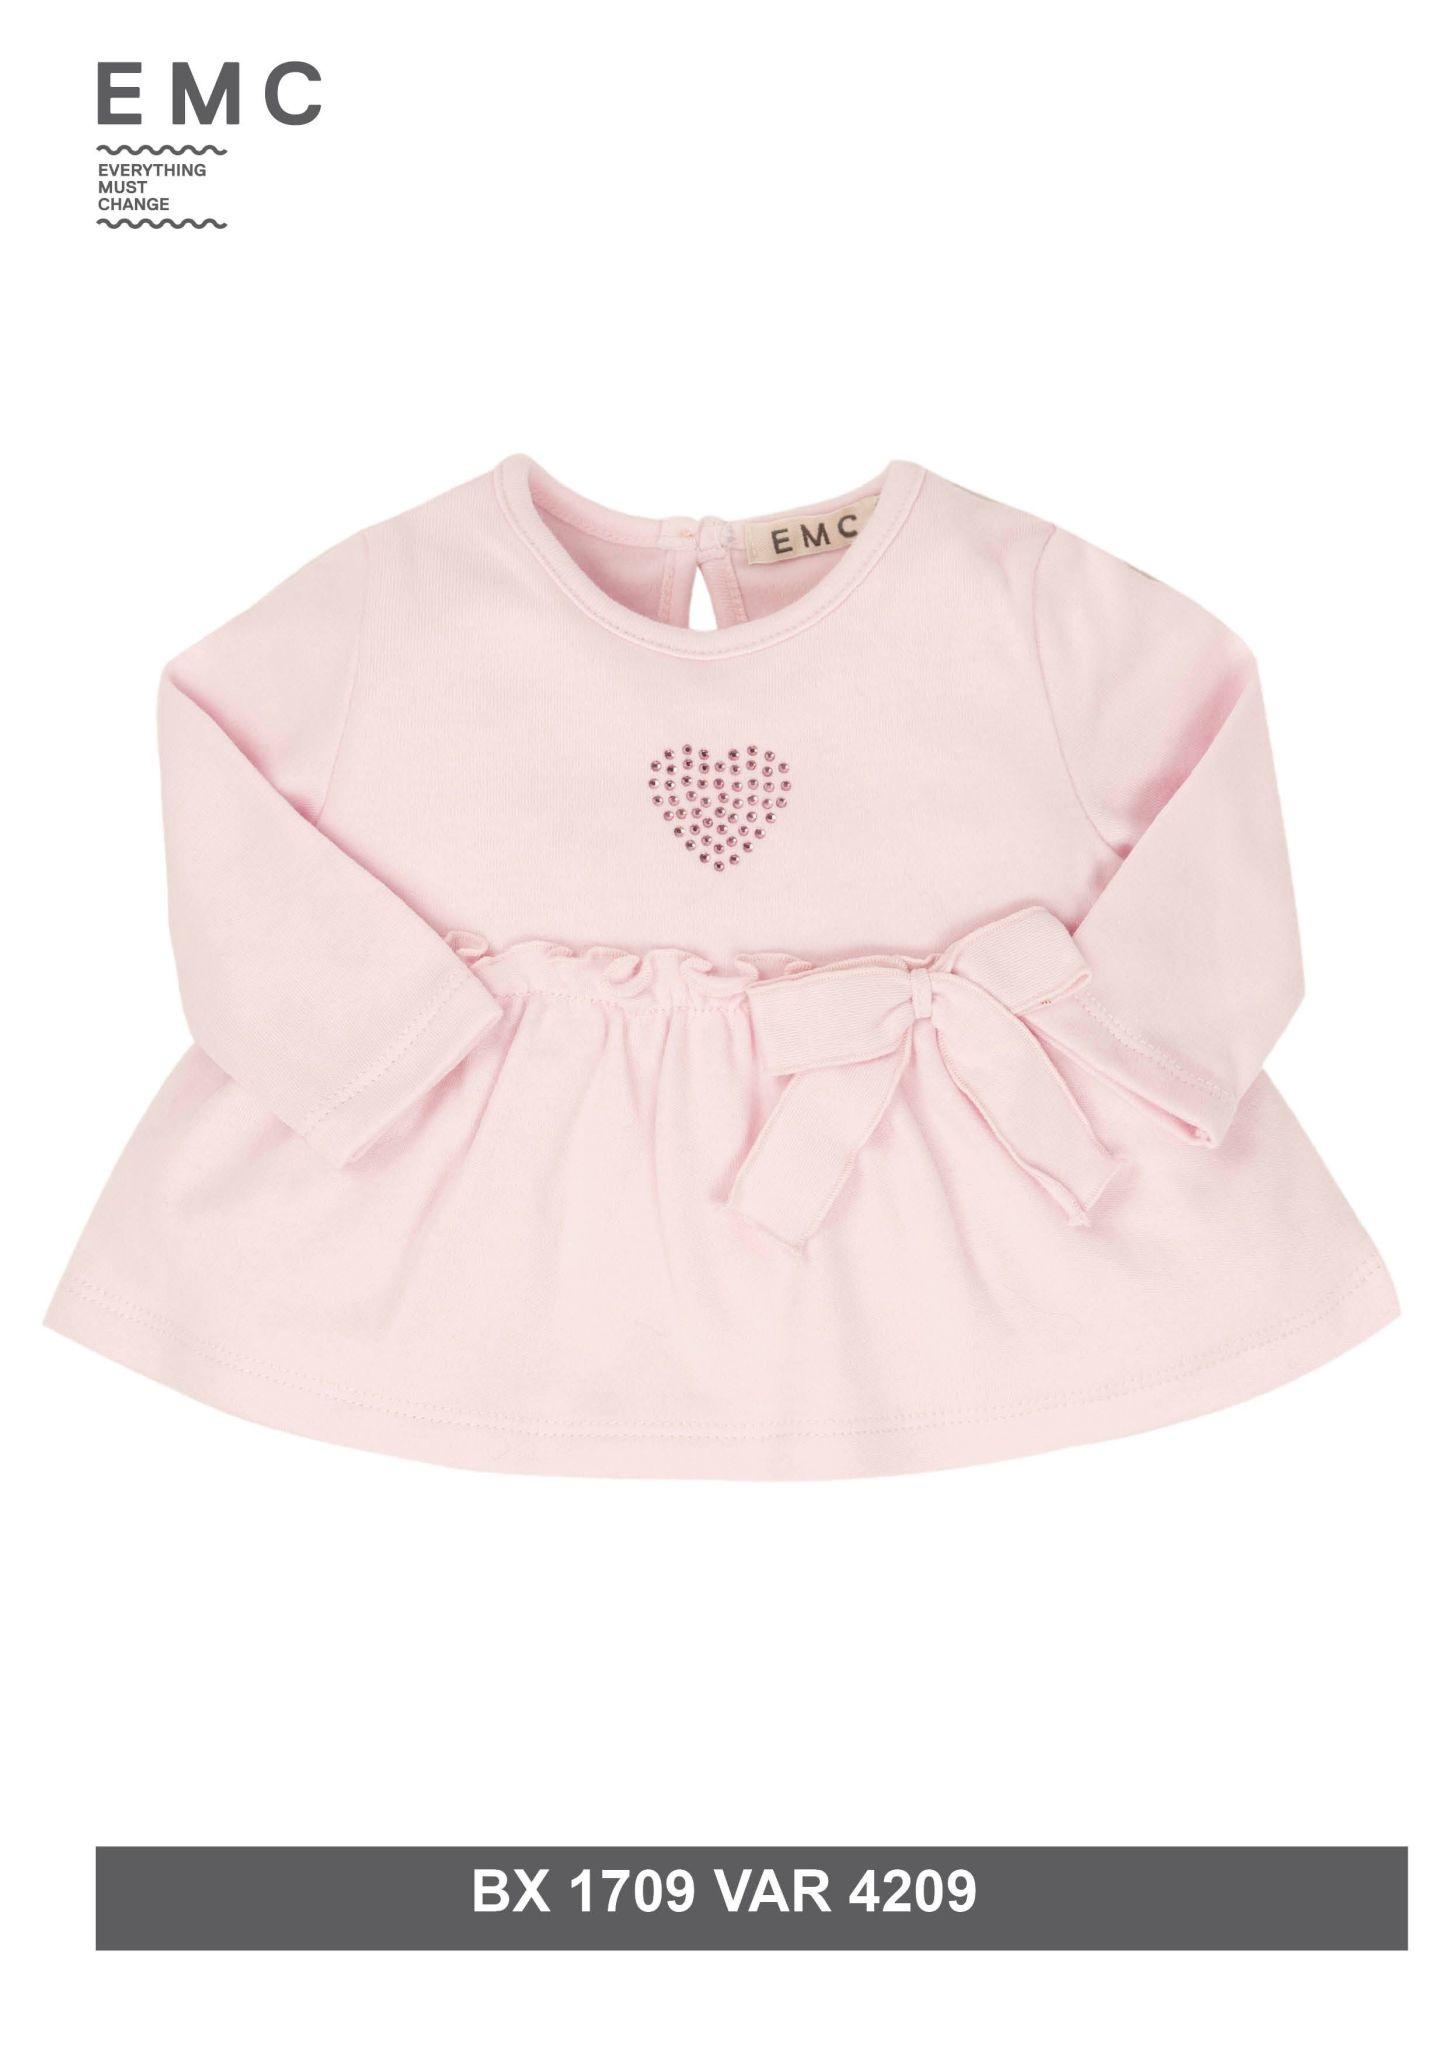 EMC EMC Pink Ruffle Dress